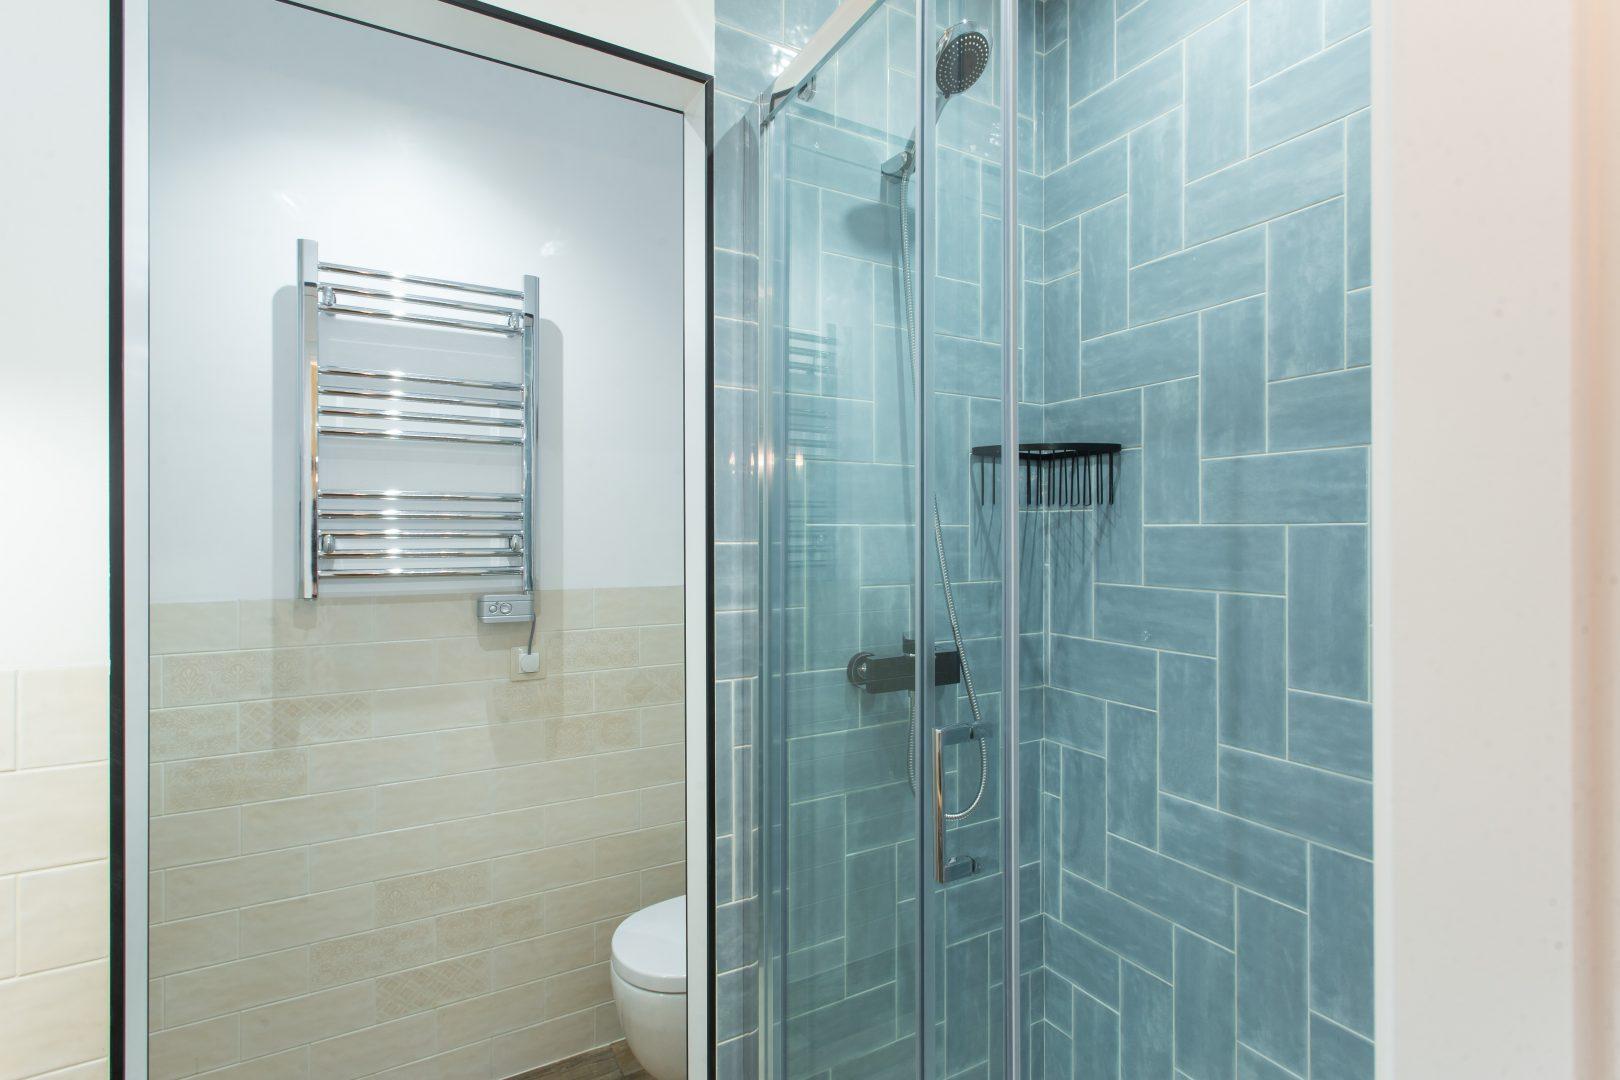 ducha en baño